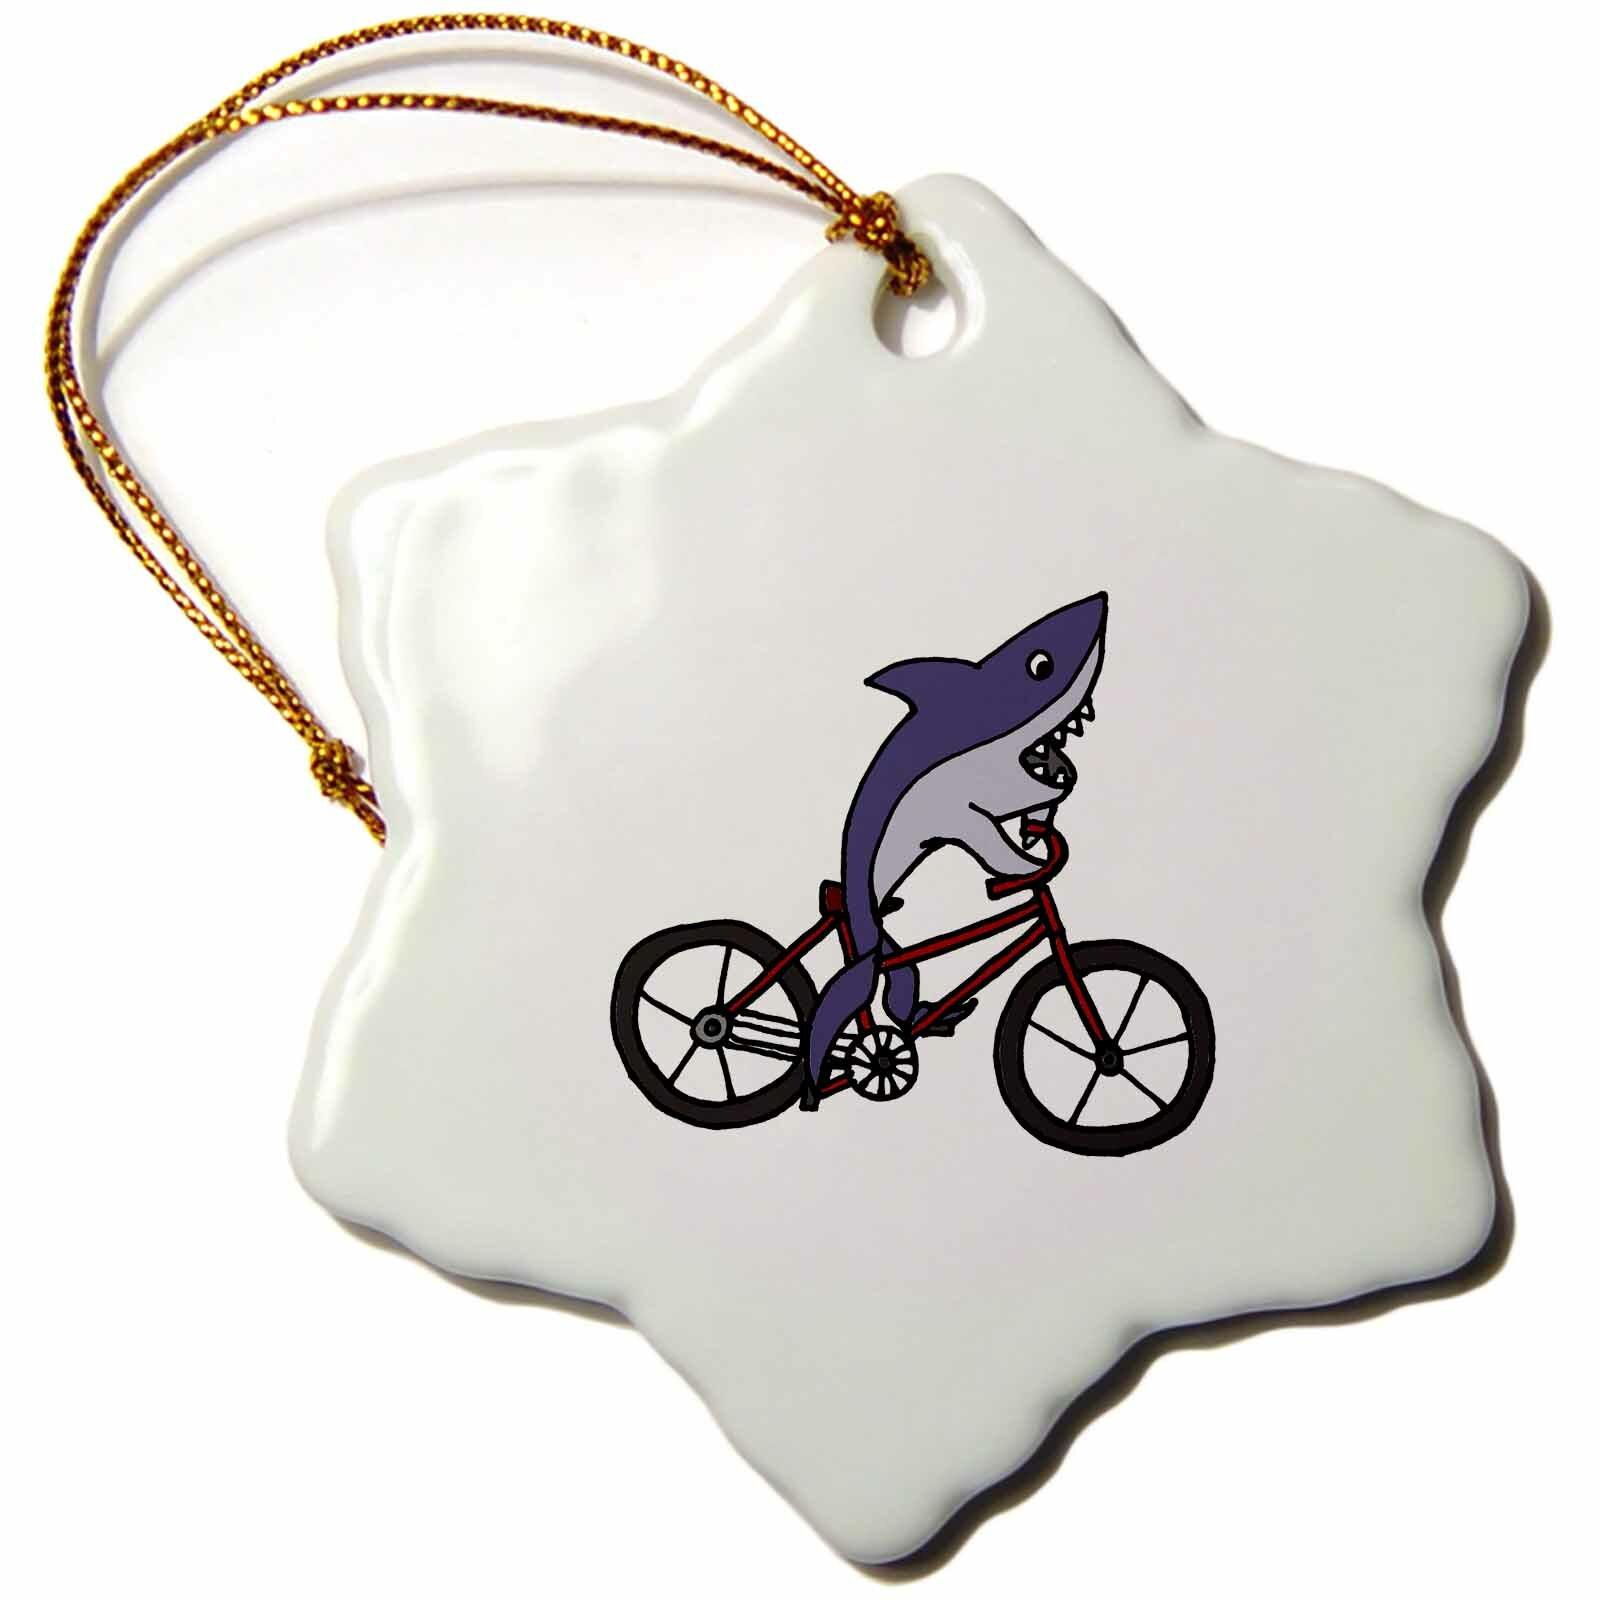 The Holiday Aisle Funny Shark Riding Bicycle Snowflake Holiday Shaped Ornament Wayfair